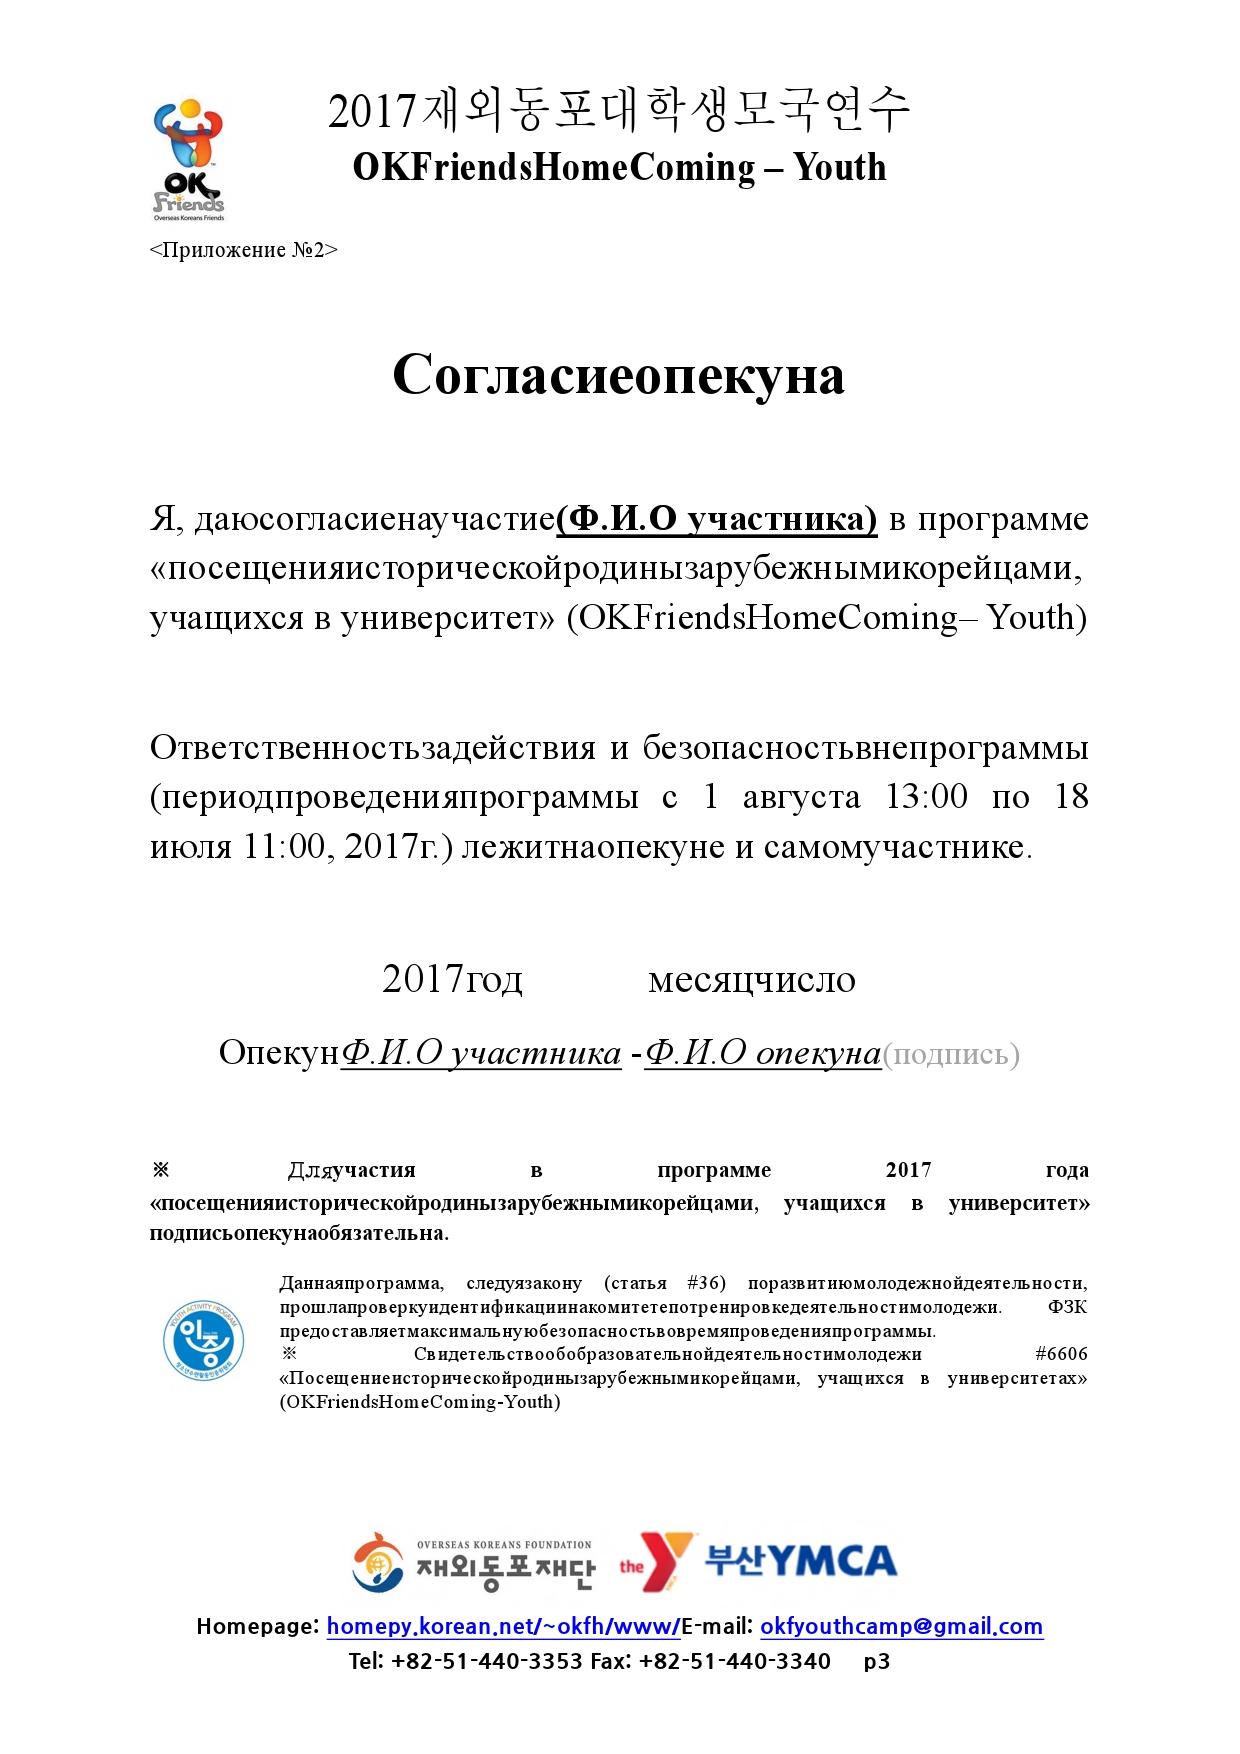 2017_OKF_YOUTH_INFO_1_RUS_1-3.jpg